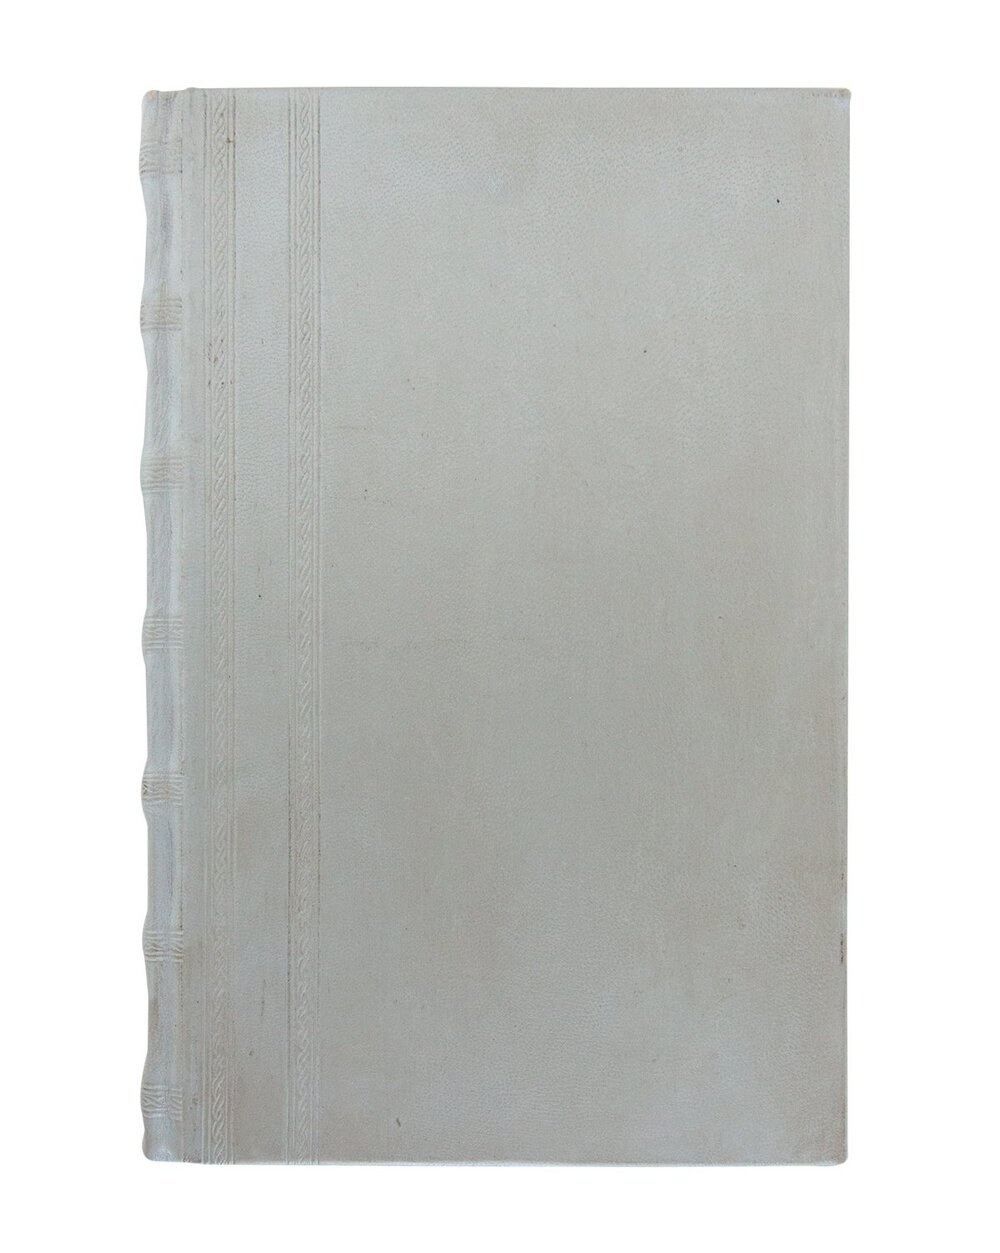 Scroll_Spine_Book-1.jpg